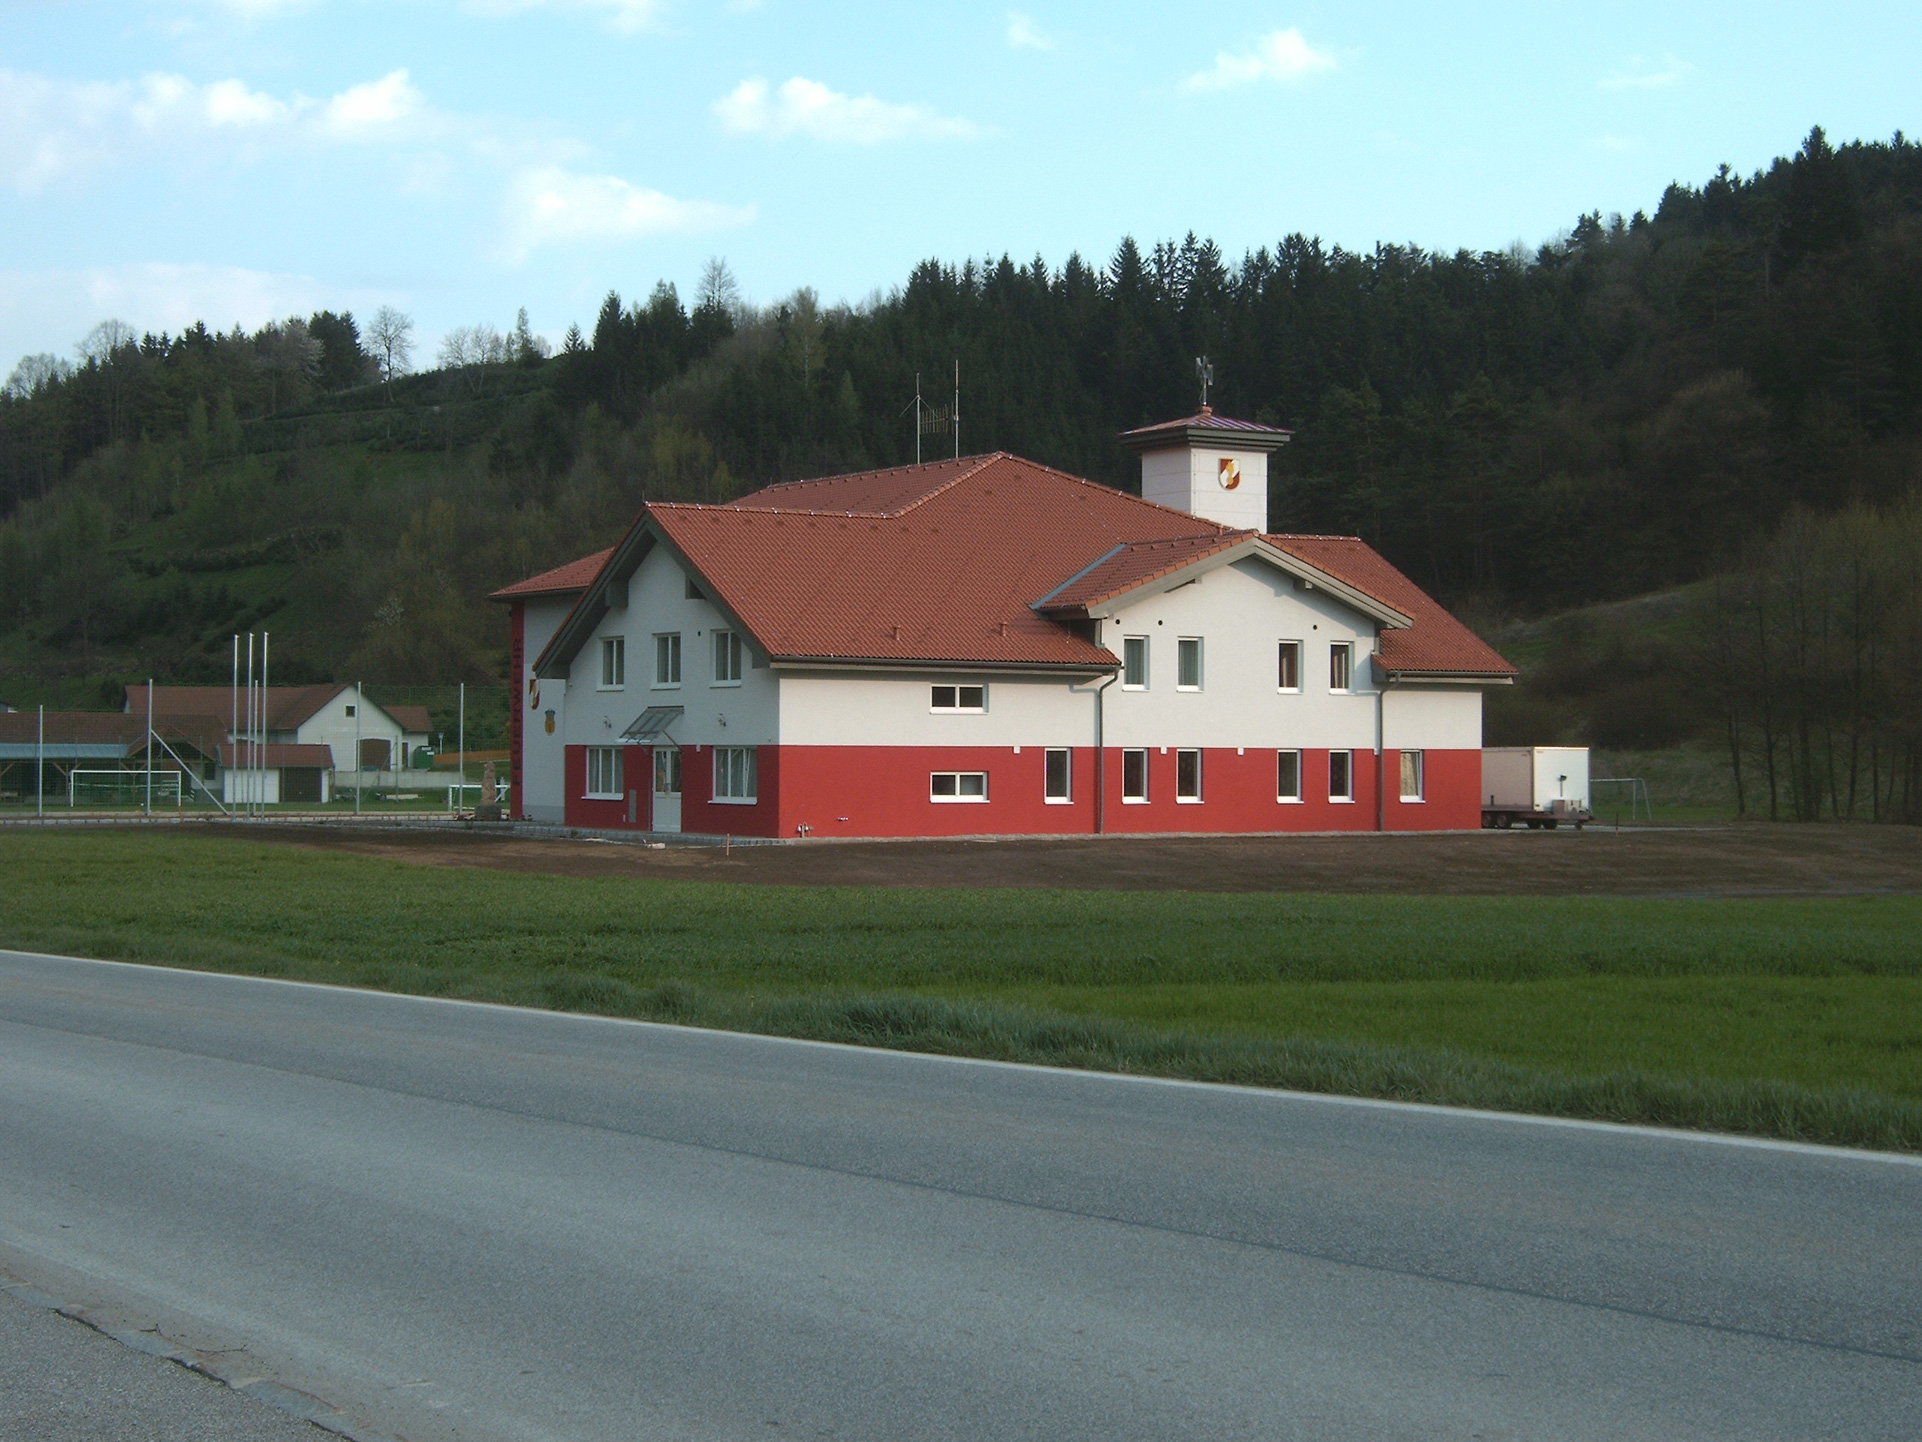 Feuerwehrhaus Weiten